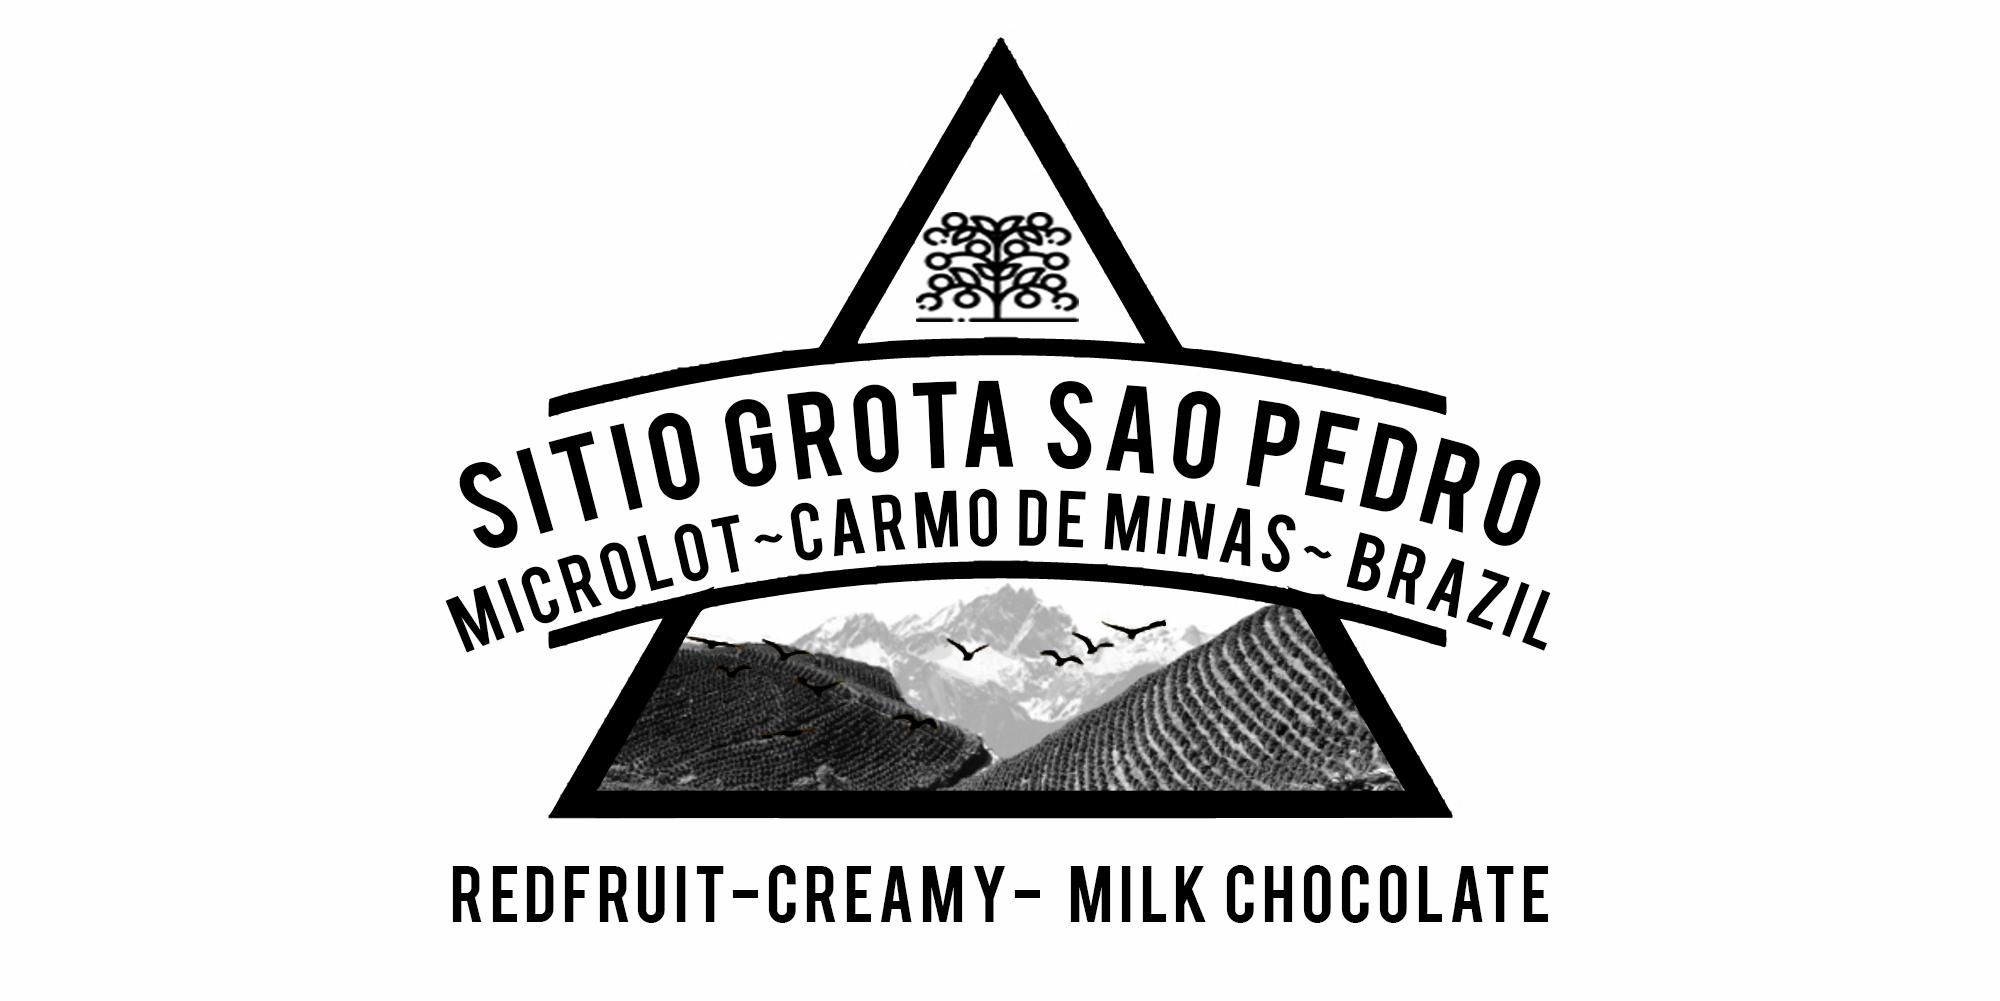 SITIO GROTA MICROLOT, CARMO DE MINAS BRAZIL COFFEE